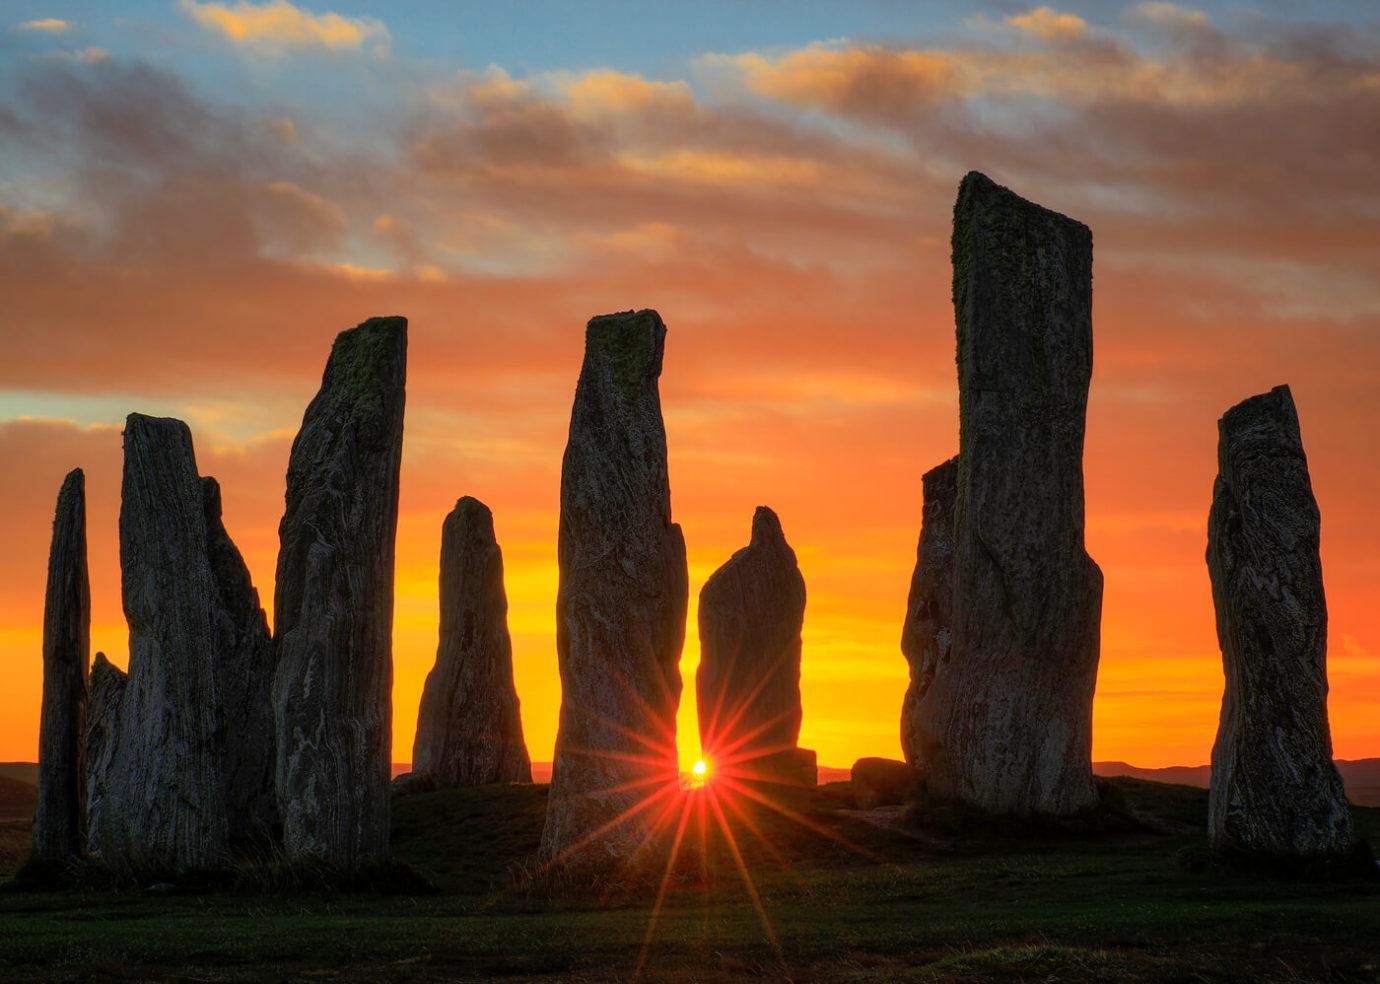 Sunrise, Callanish Stones, Isle of Lewis